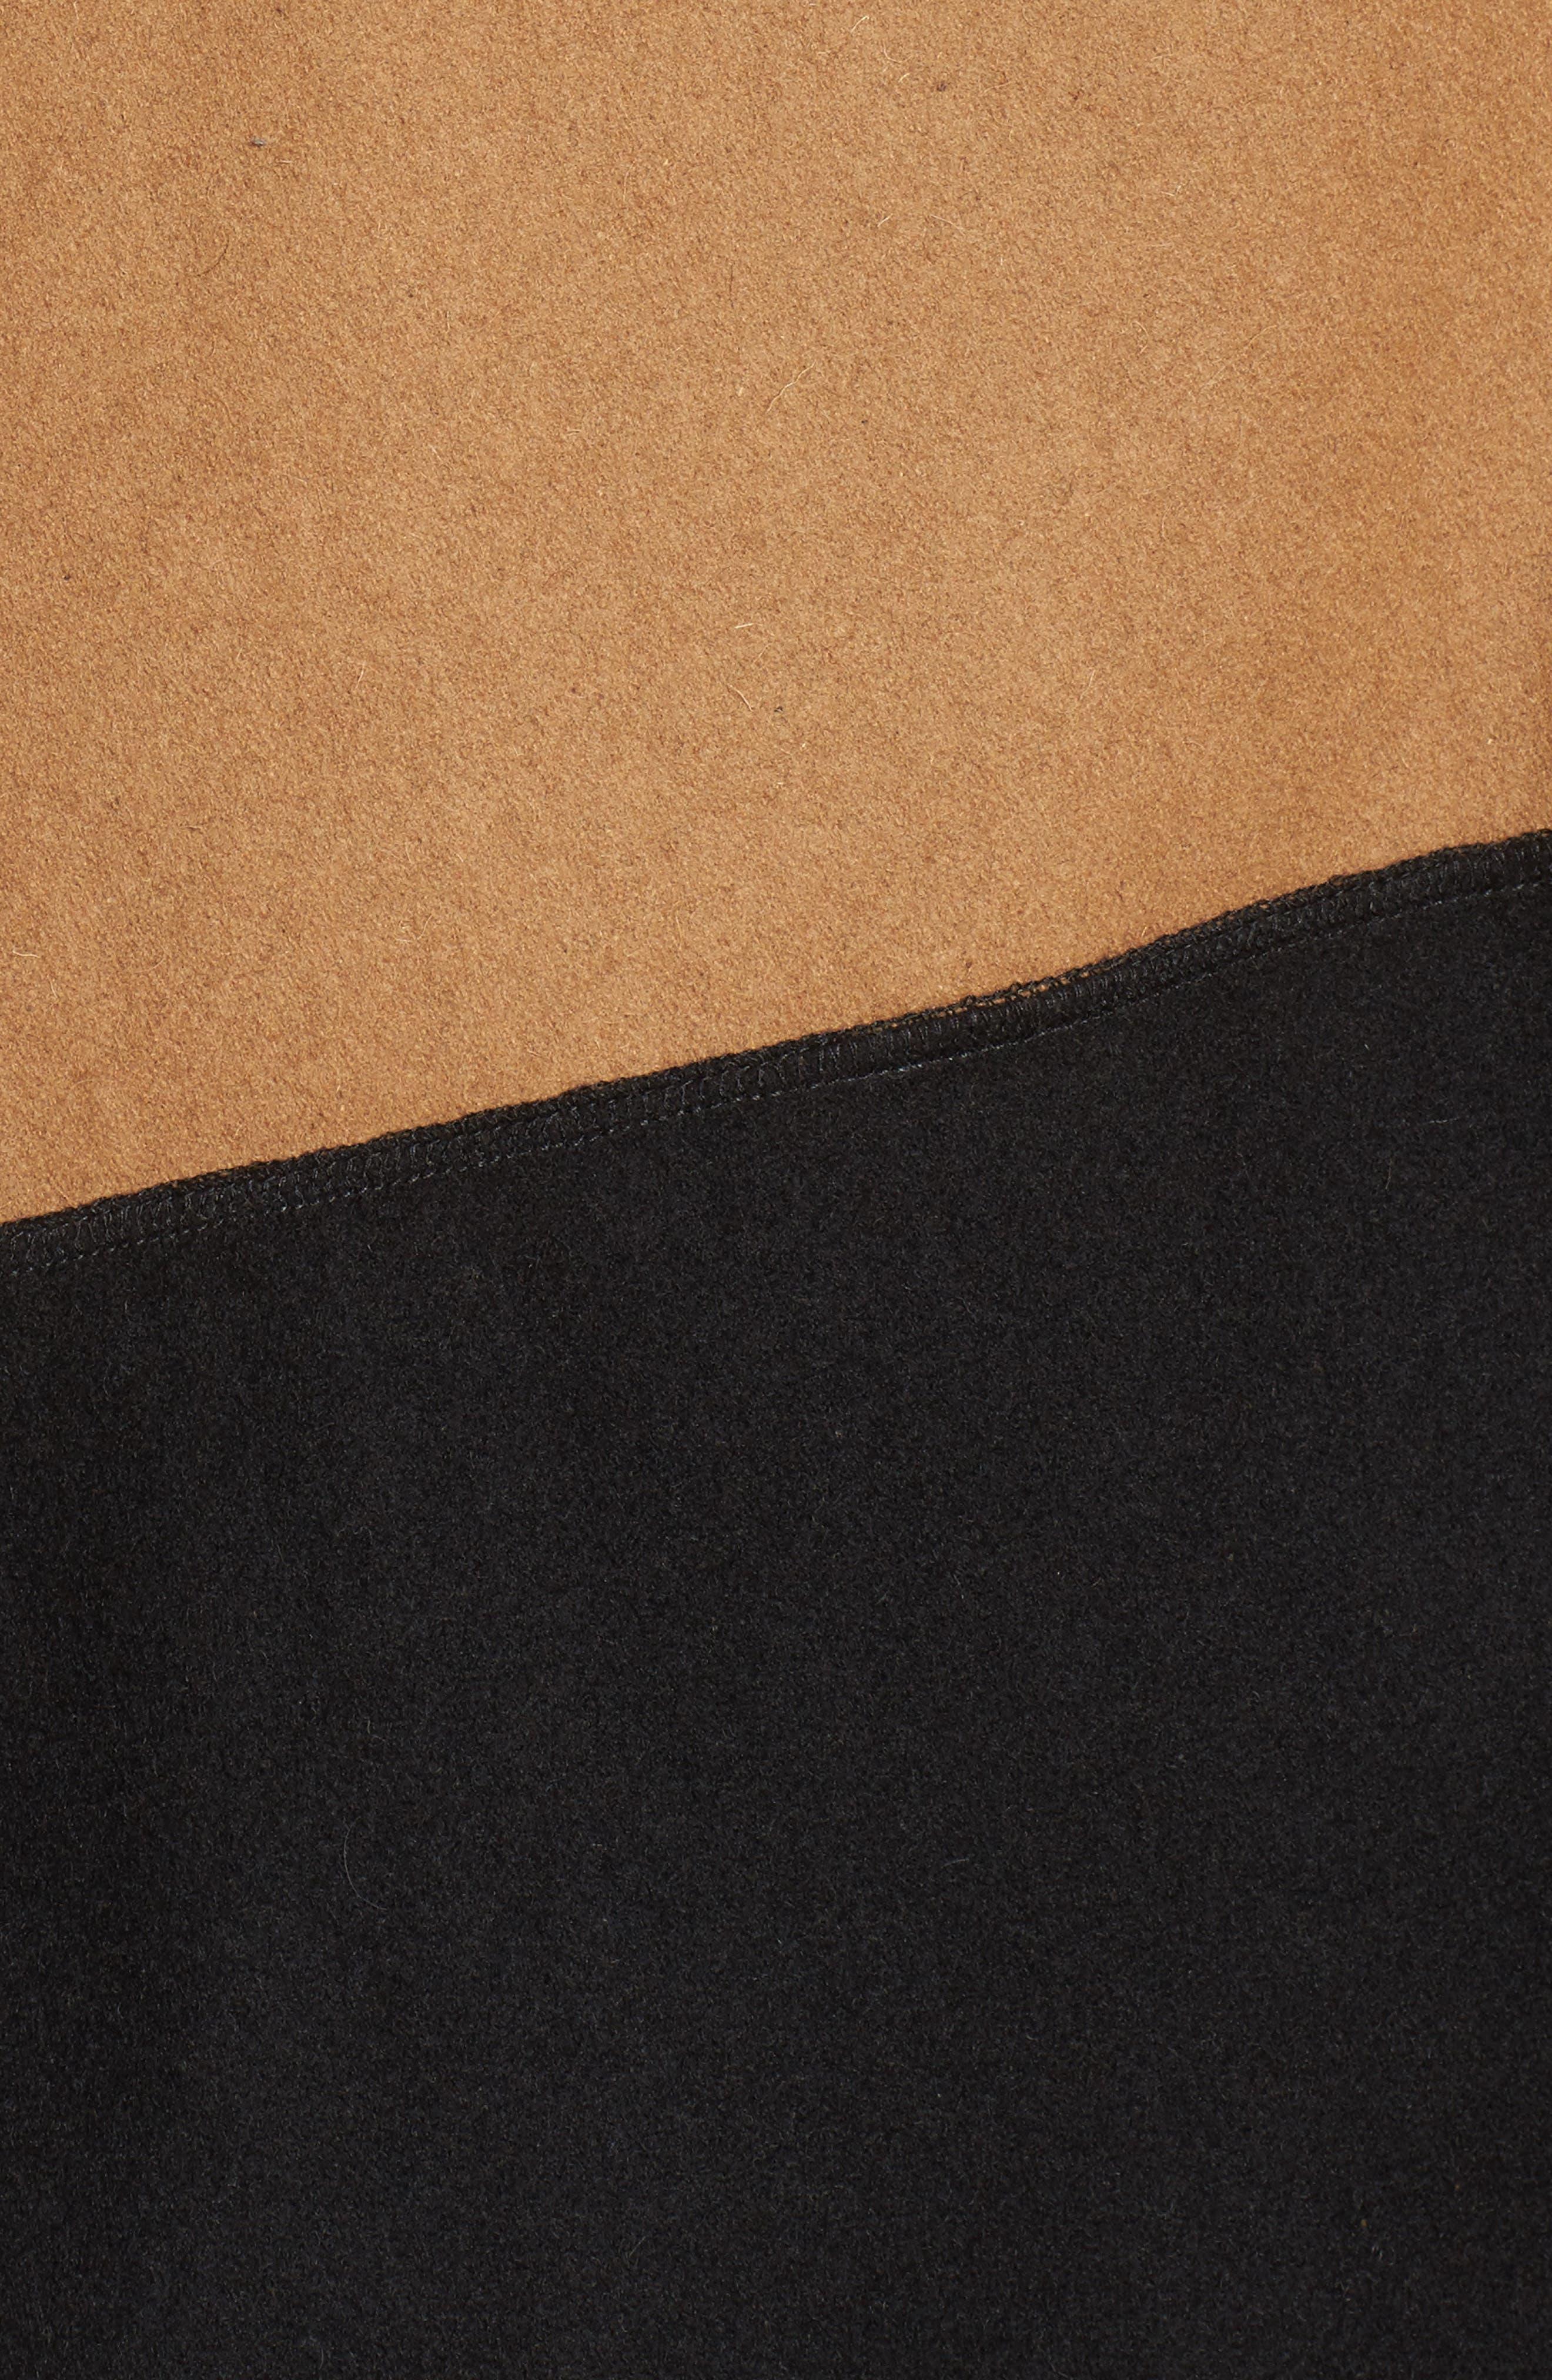 Duo Wonder Wool Cape,                             Alternate thumbnail 5, color,                             Camel/ Black